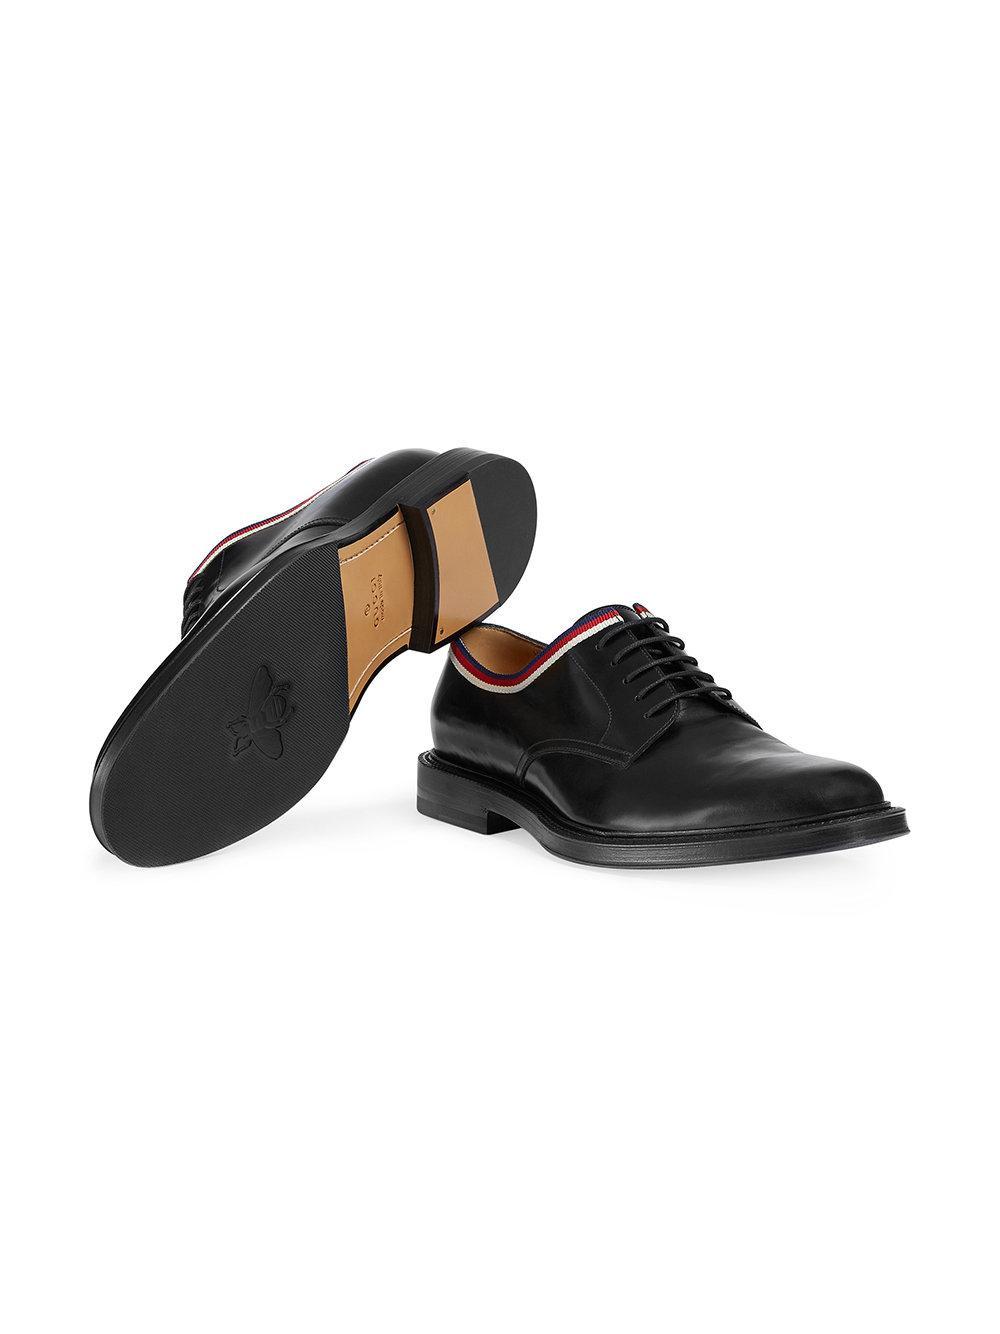 15d93da411d Gucci - Black Leather Lace-up for Men - Lyst. View fullscreen